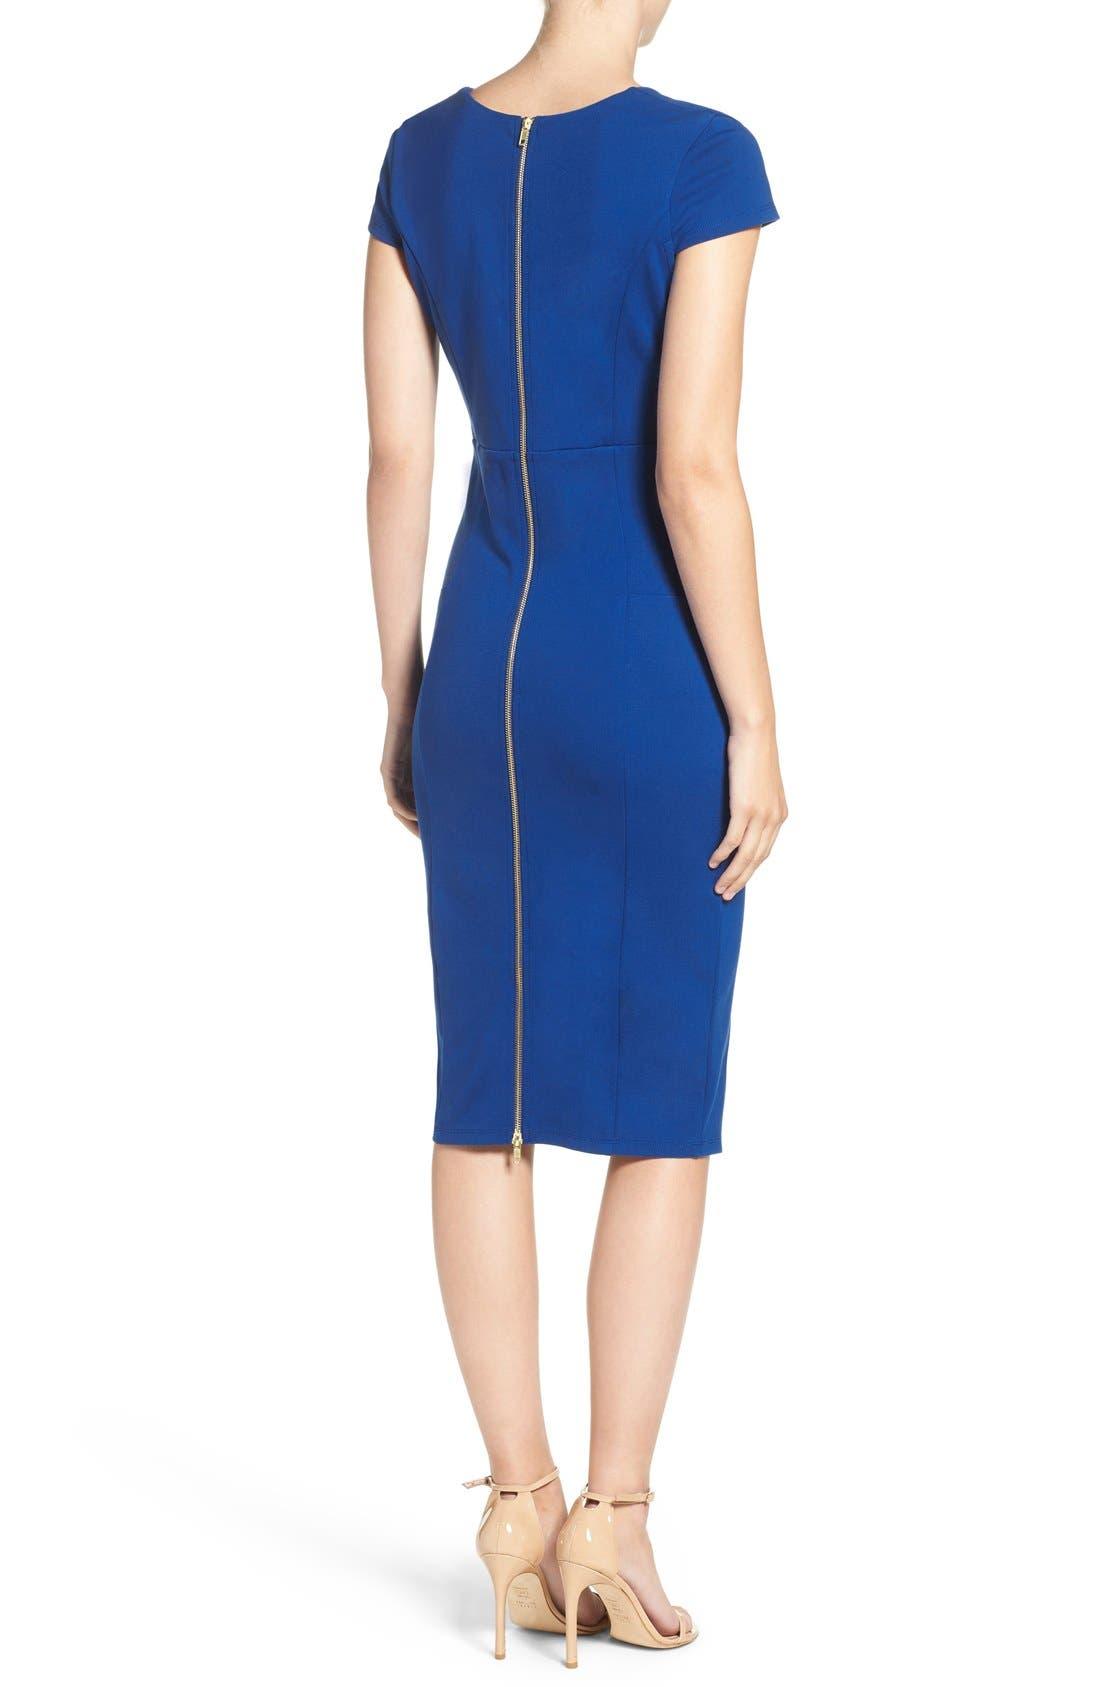 Alternate Image 2  - Felicity & Coco V-Neck Ponte Knit Midi Sheath Dress (Regular & Petite) (Nordstrom Exclusive)